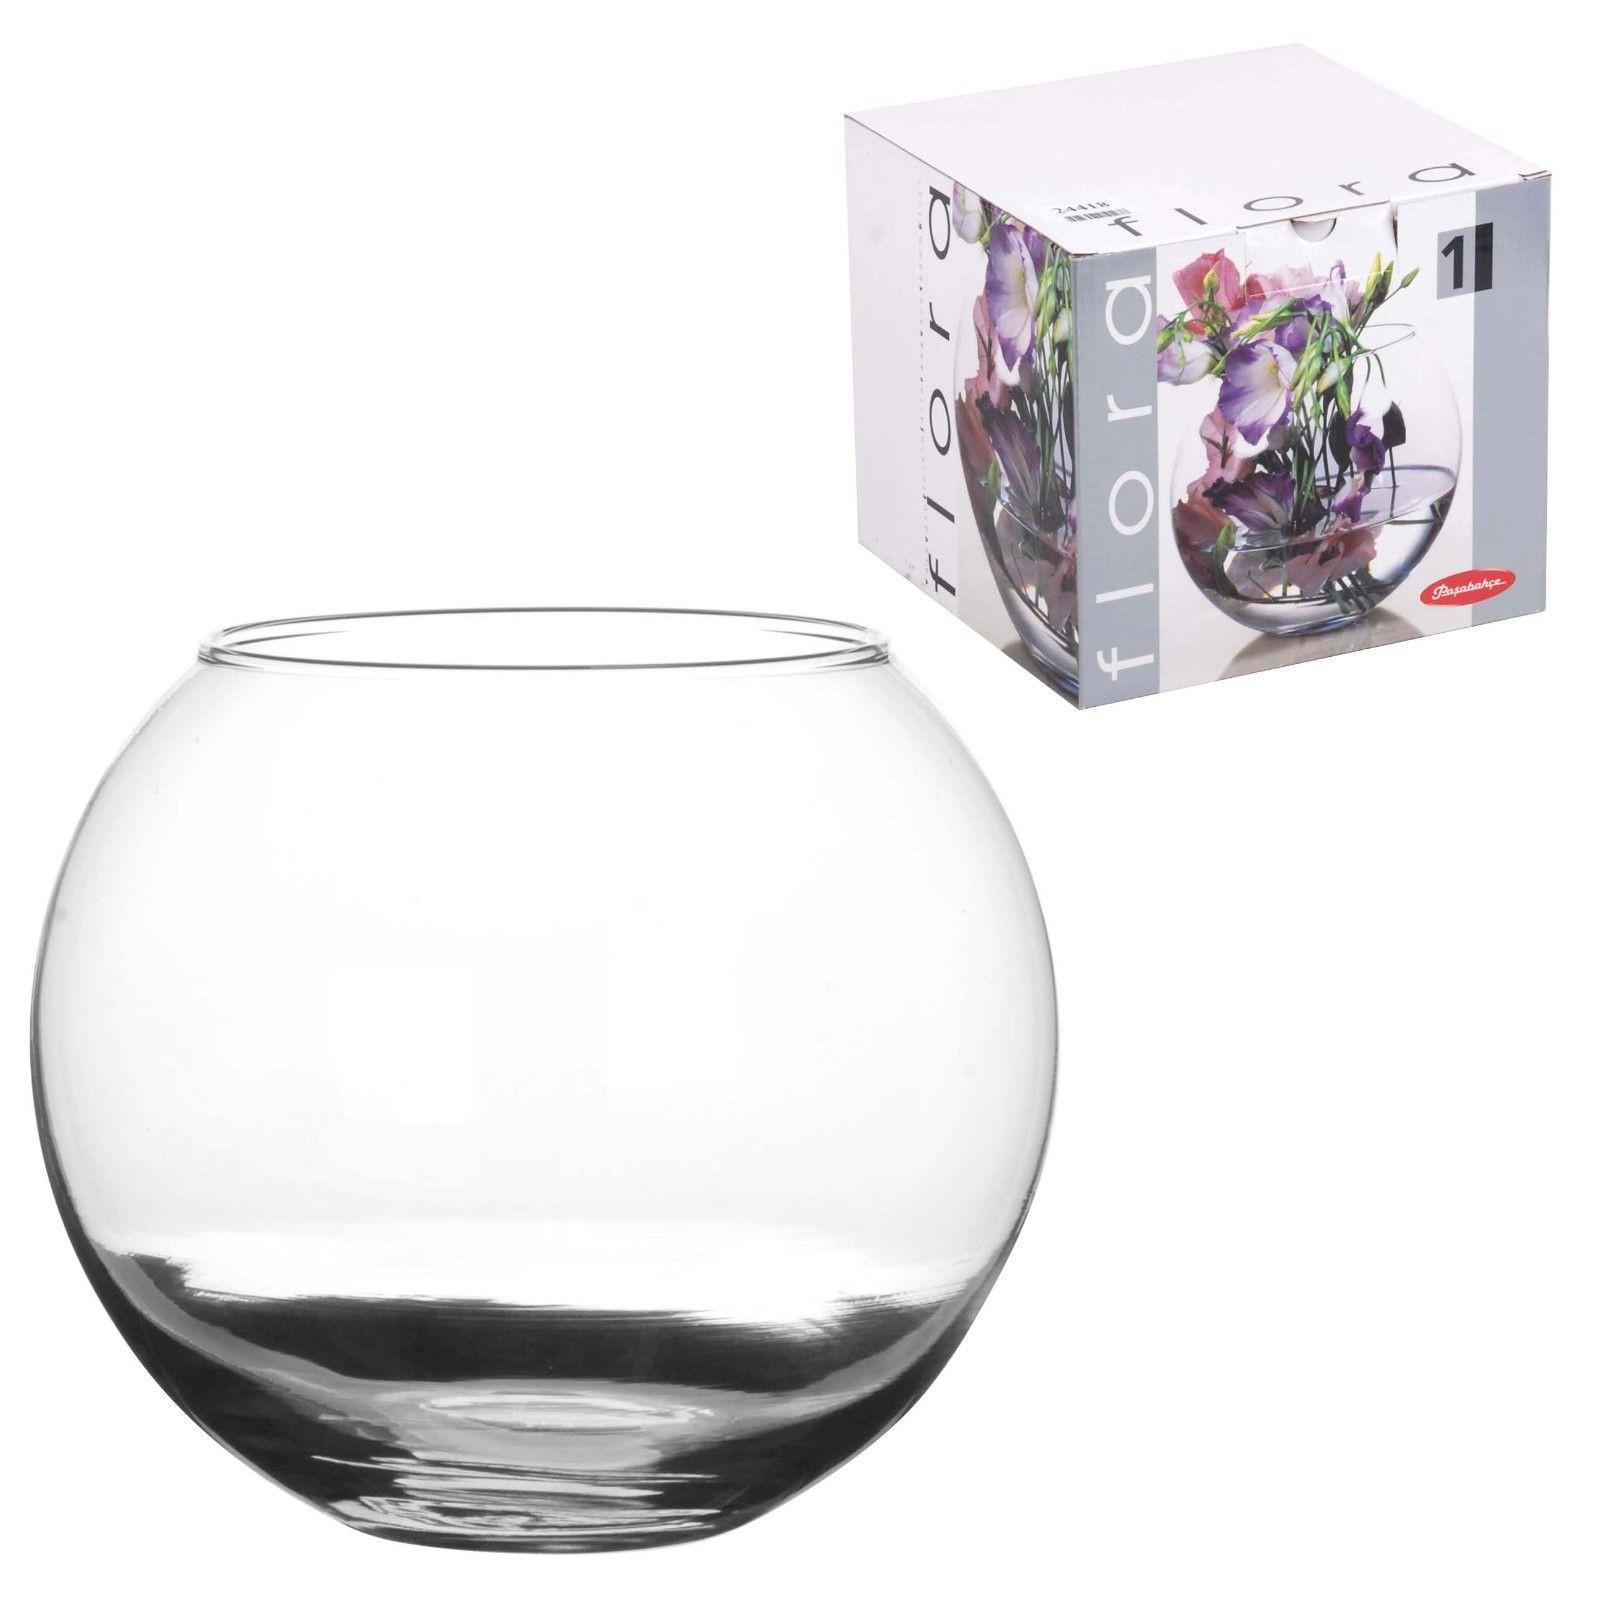 Round Vase Flower Arrangements Of Pasabaha§e Flower Vase Glass Bowl Centrepiece Round Balloon Bubble with Pasabaha§e Flower Vase Glass Bowl Centrepiece Round Balloon Bubble Partyware Deco 1 Bowl Pasasbahce